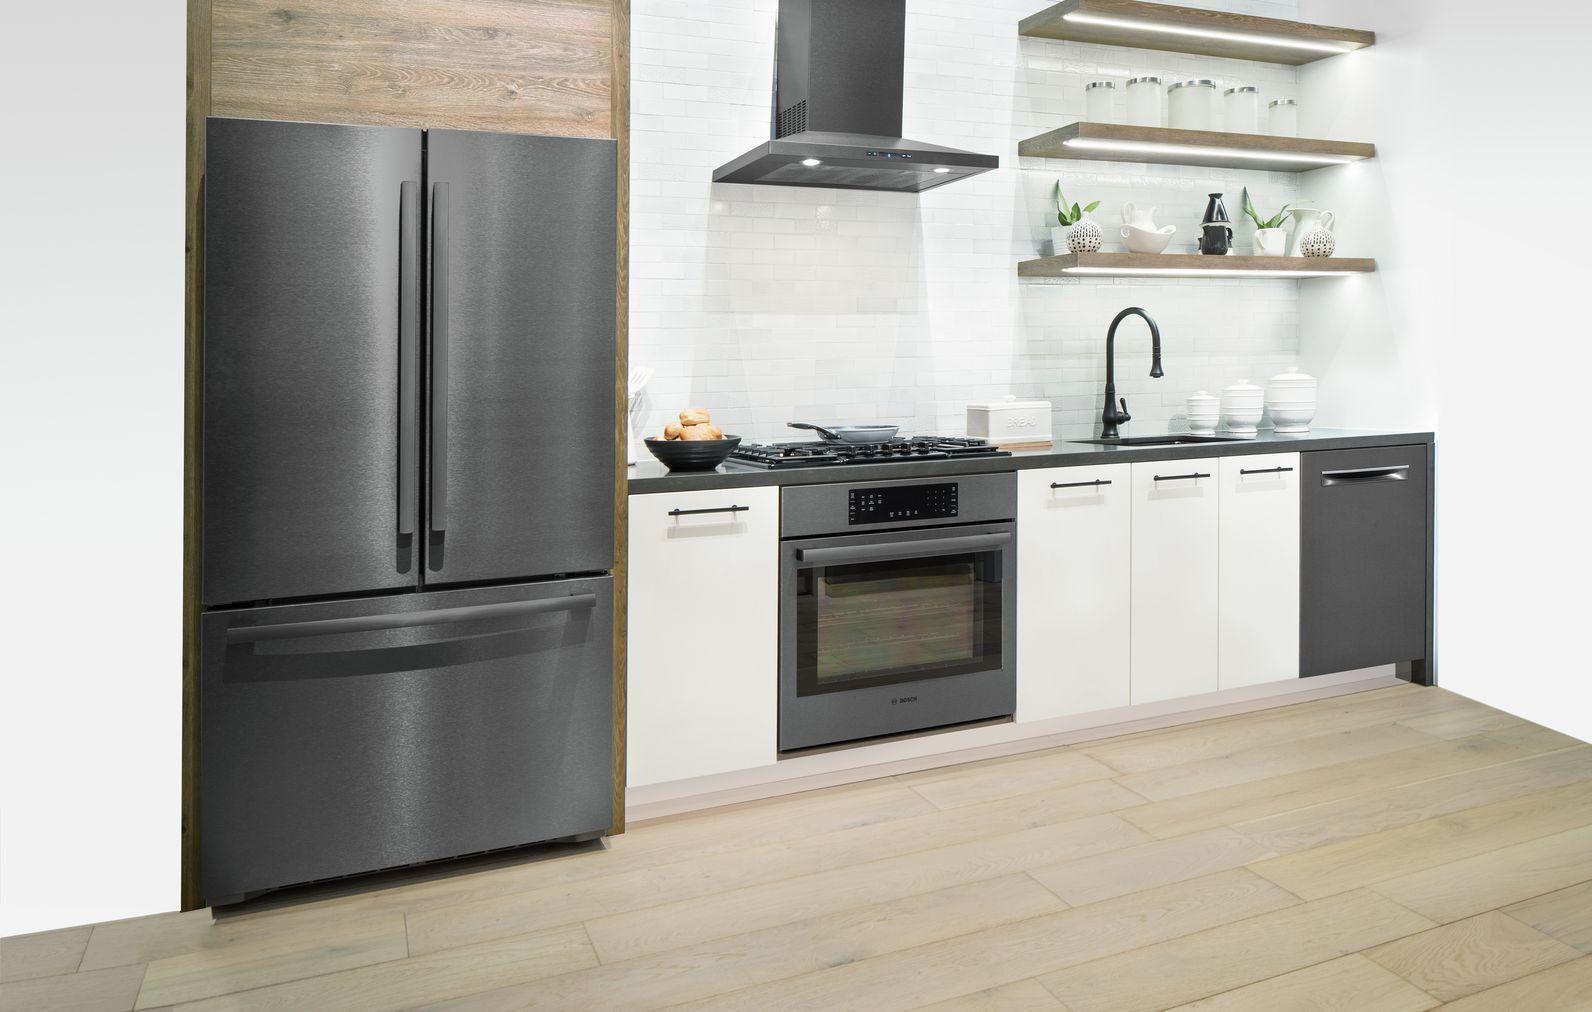 Bosch Refrigeration Arizona Wholesale Supply